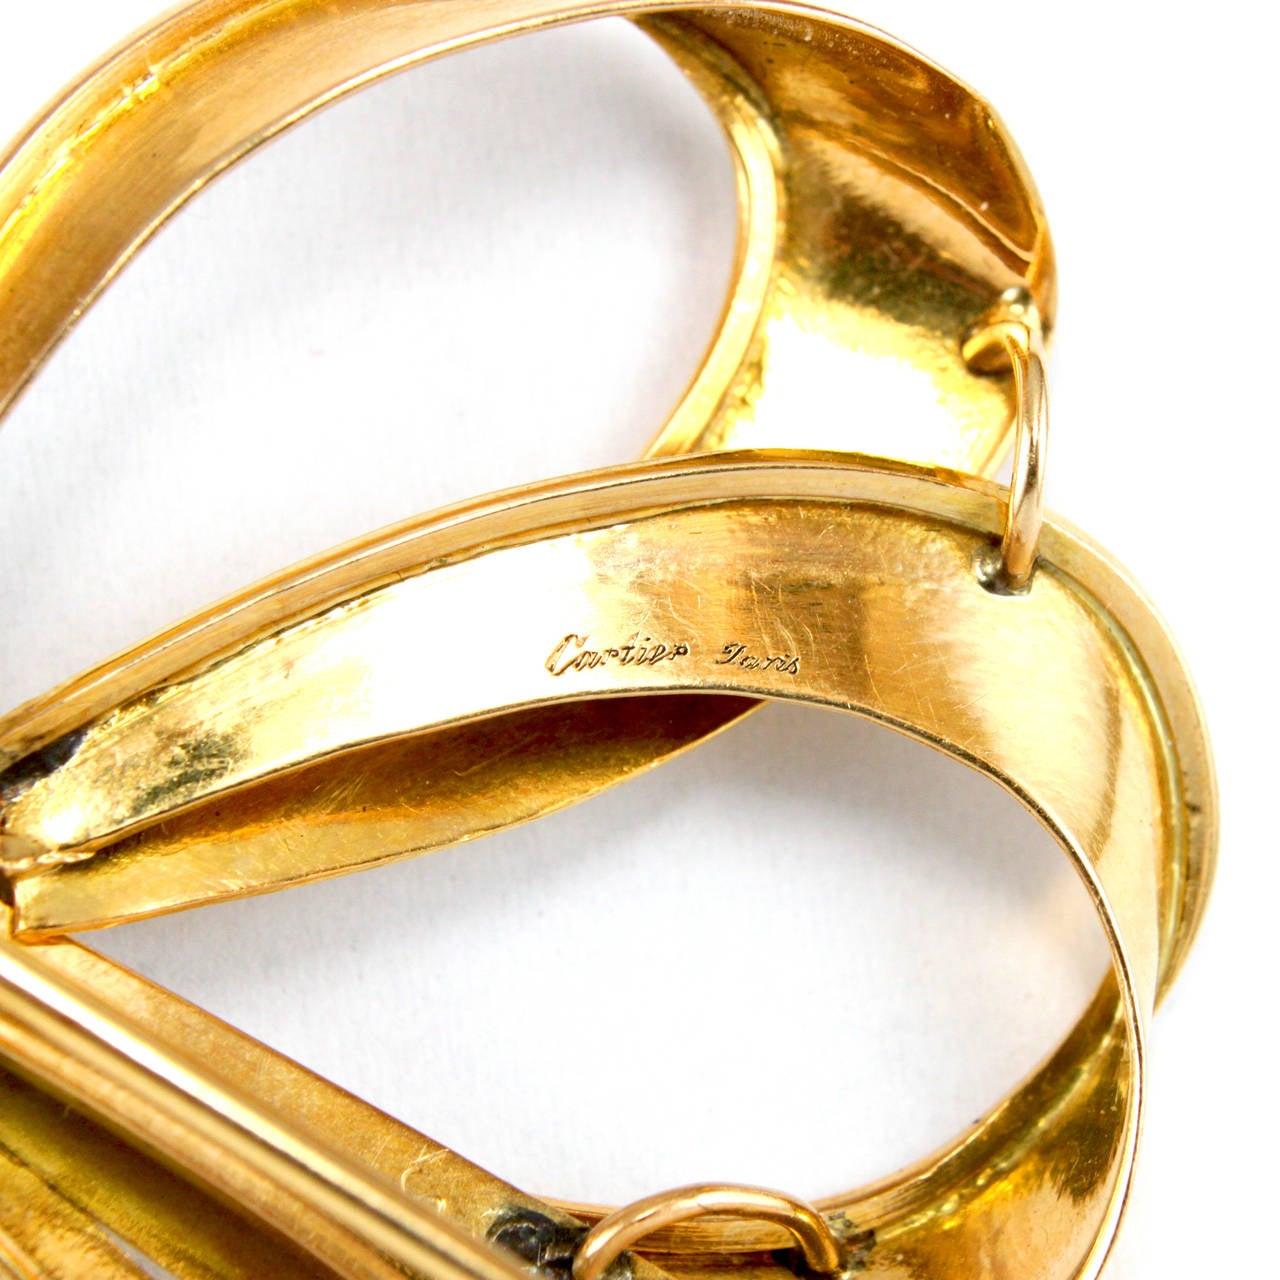 Cartier 1940s Diamond Gold Ribbon Bow Brooch In Good Condition For Sale In Idar-Oberstein, DE